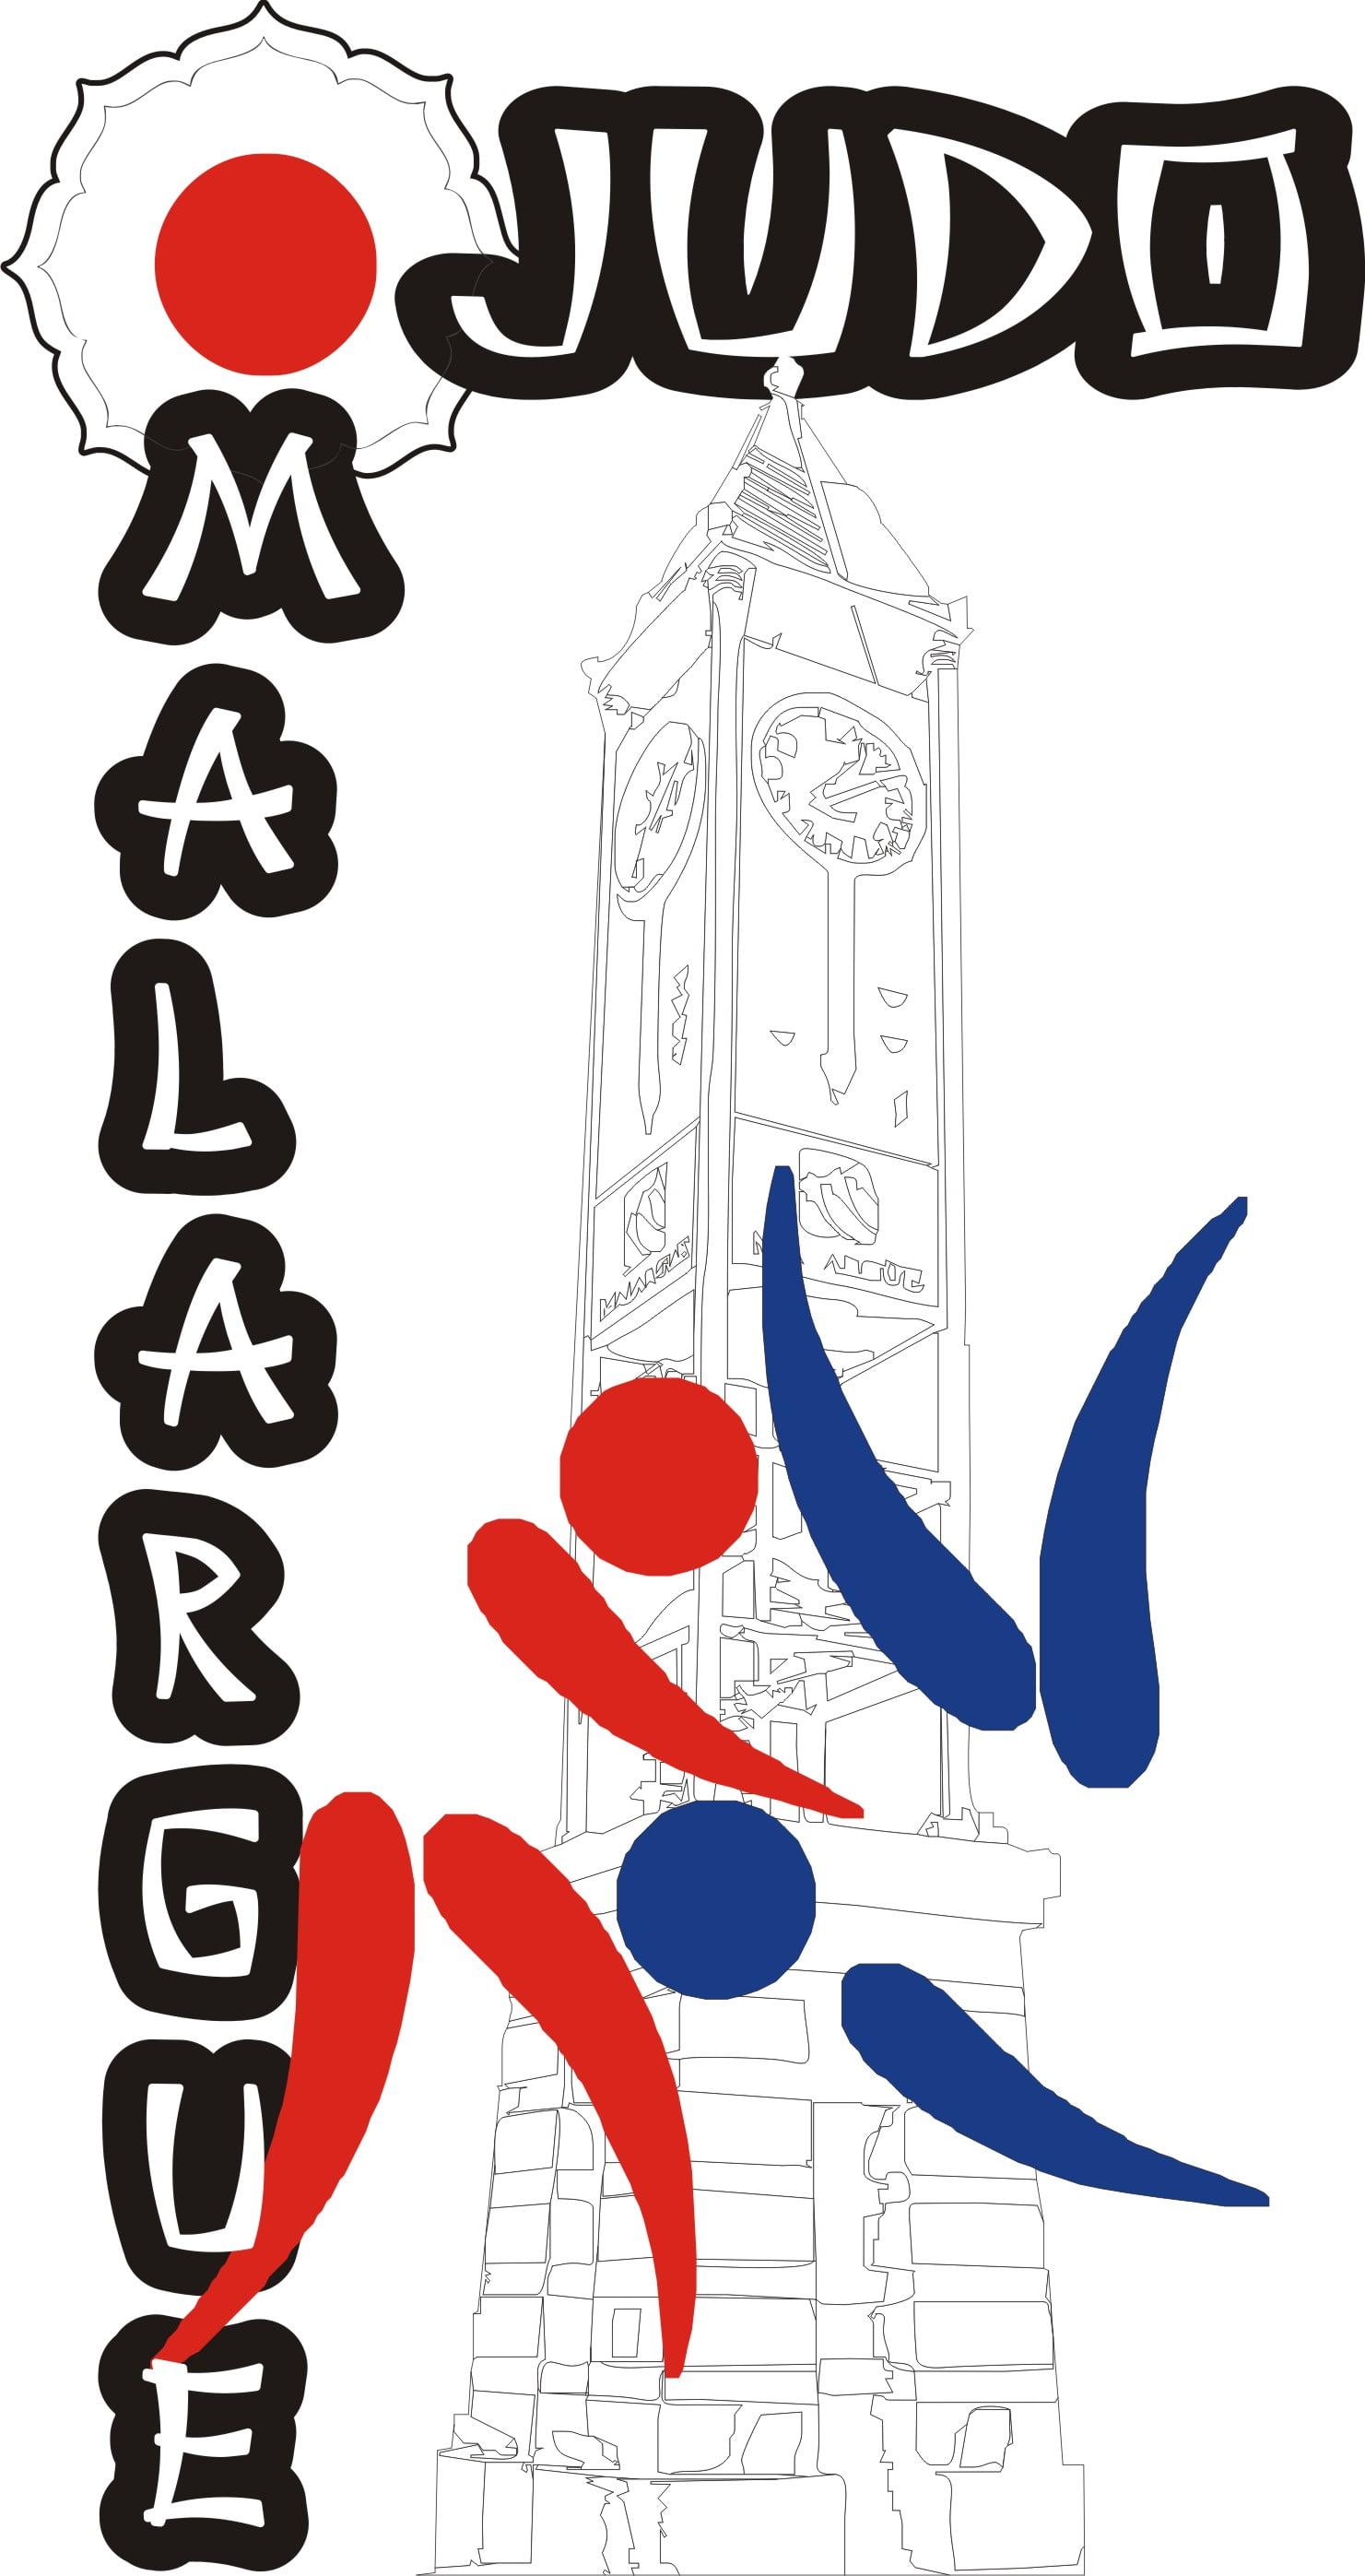 logo-judo-malargue